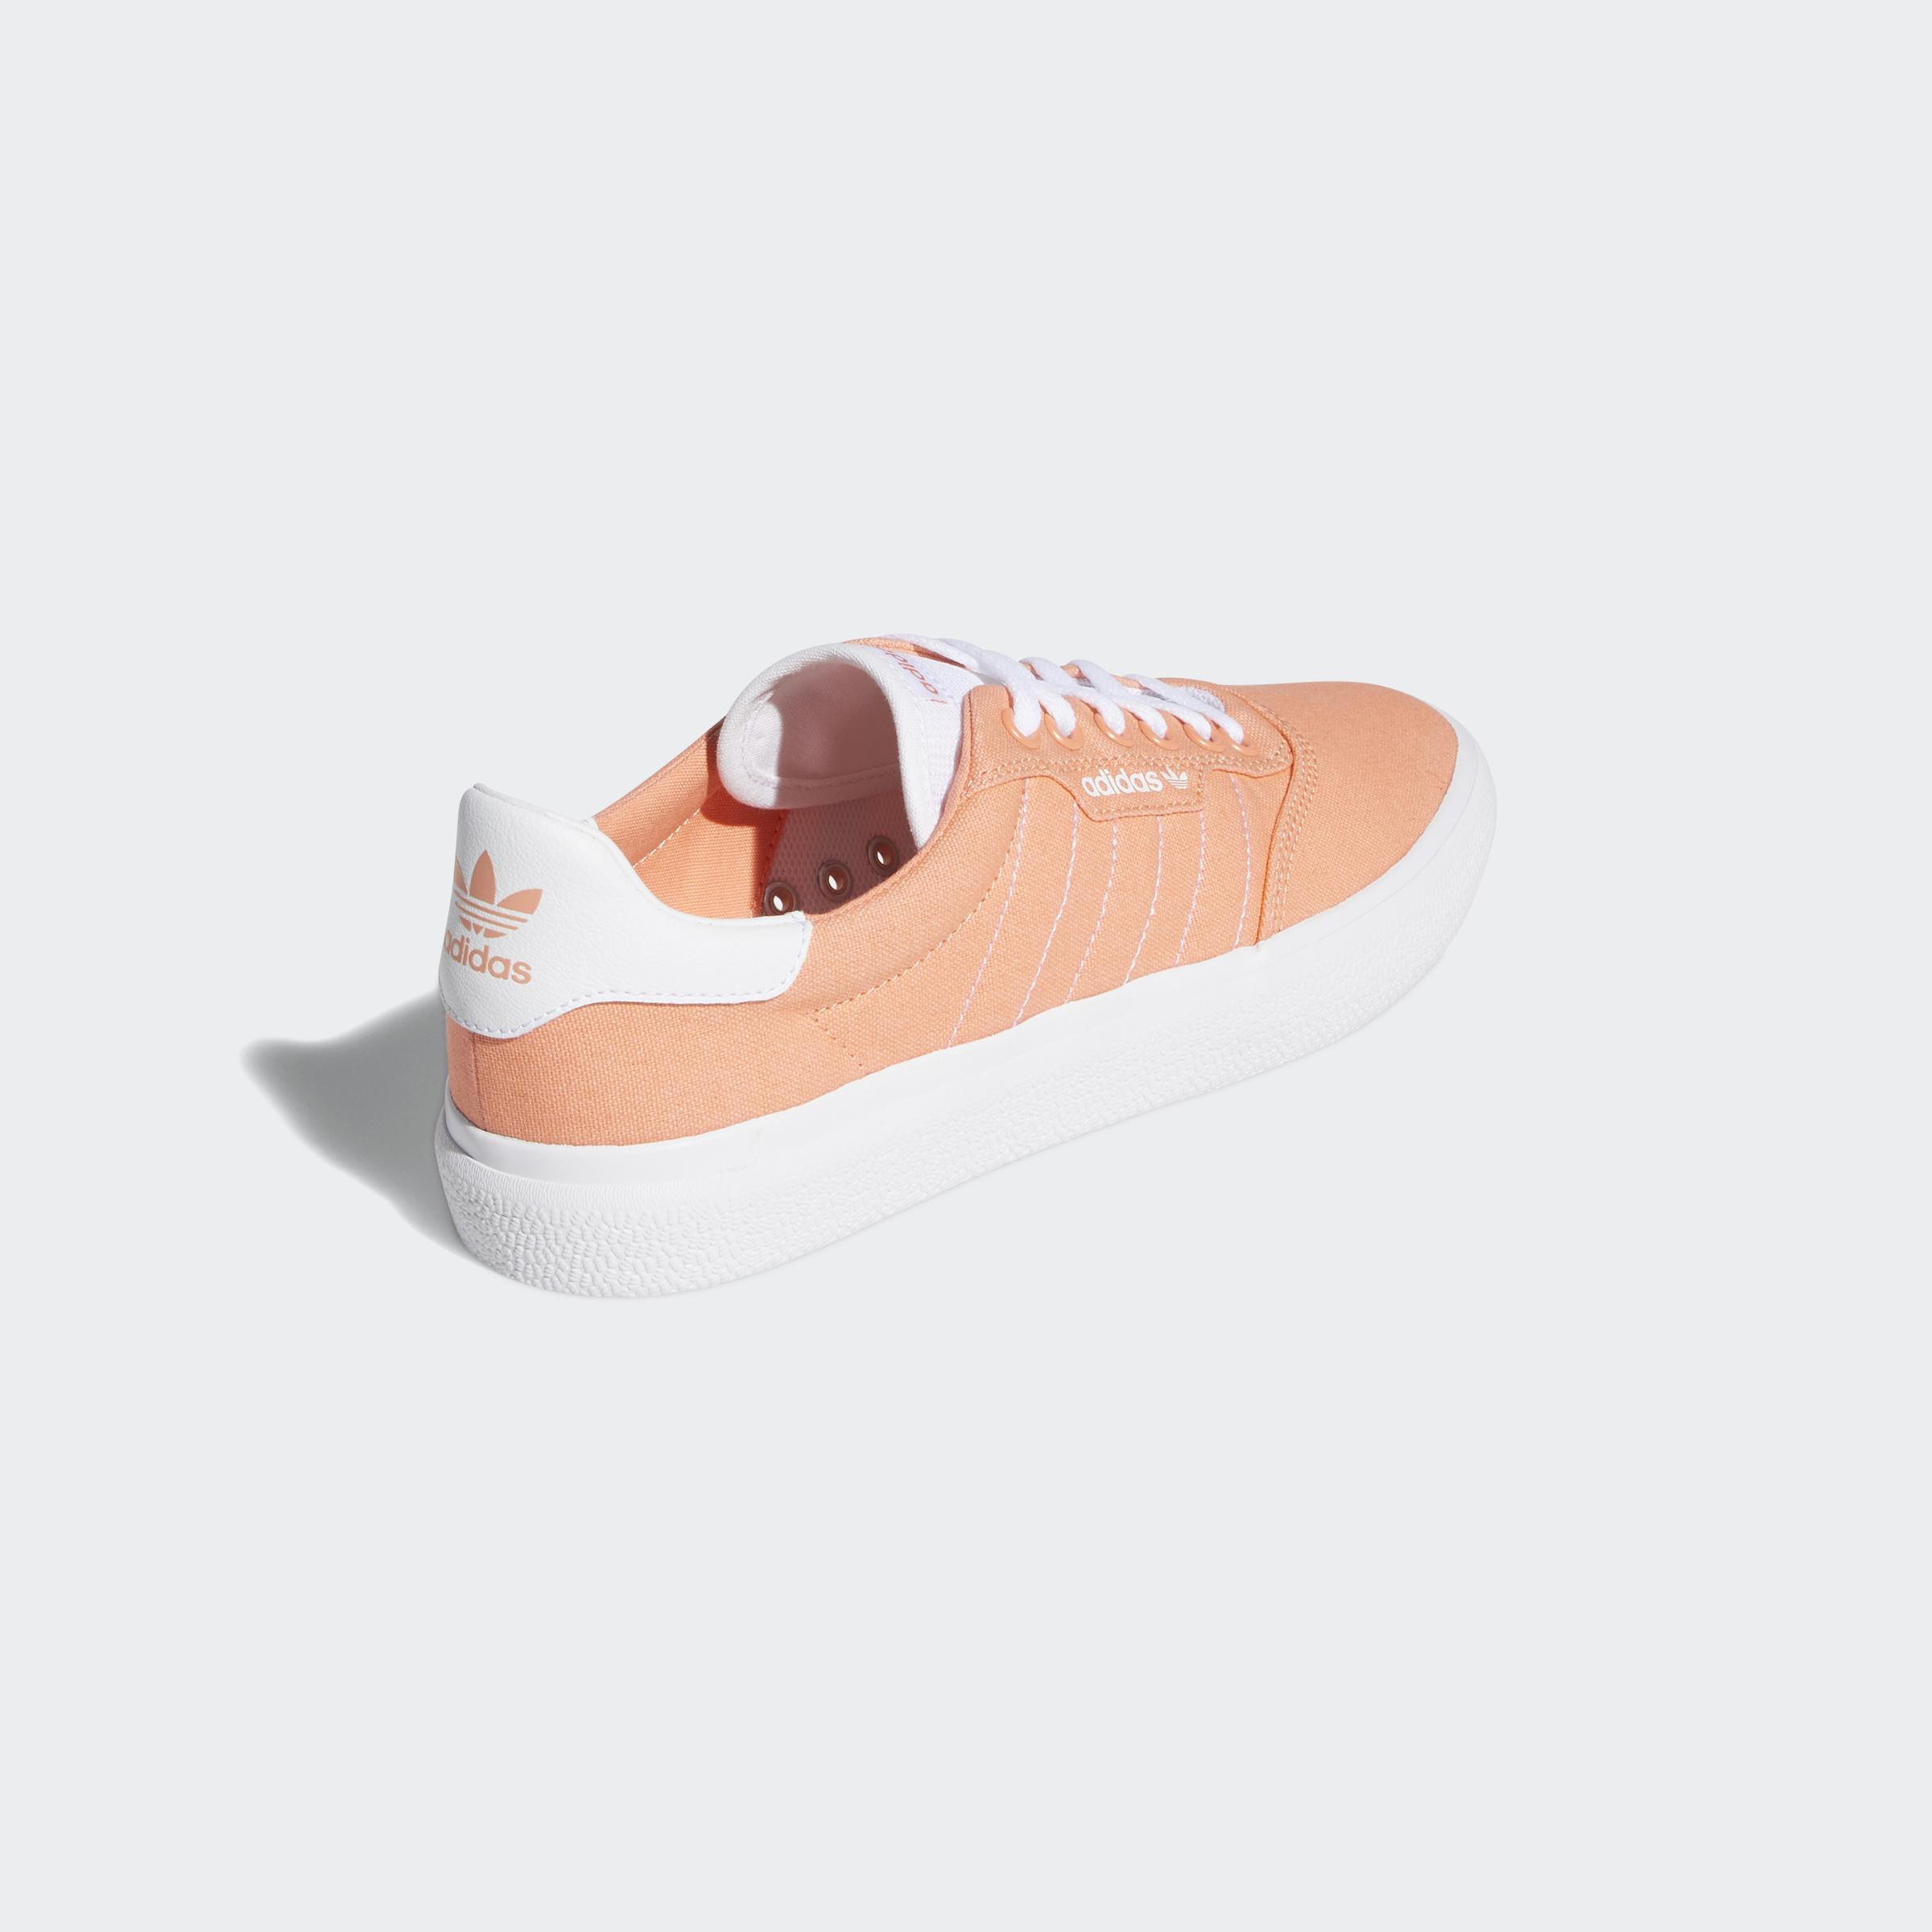 adidas-3MC-Shoes-Athletic-amp-Sneakers thumbnail 23